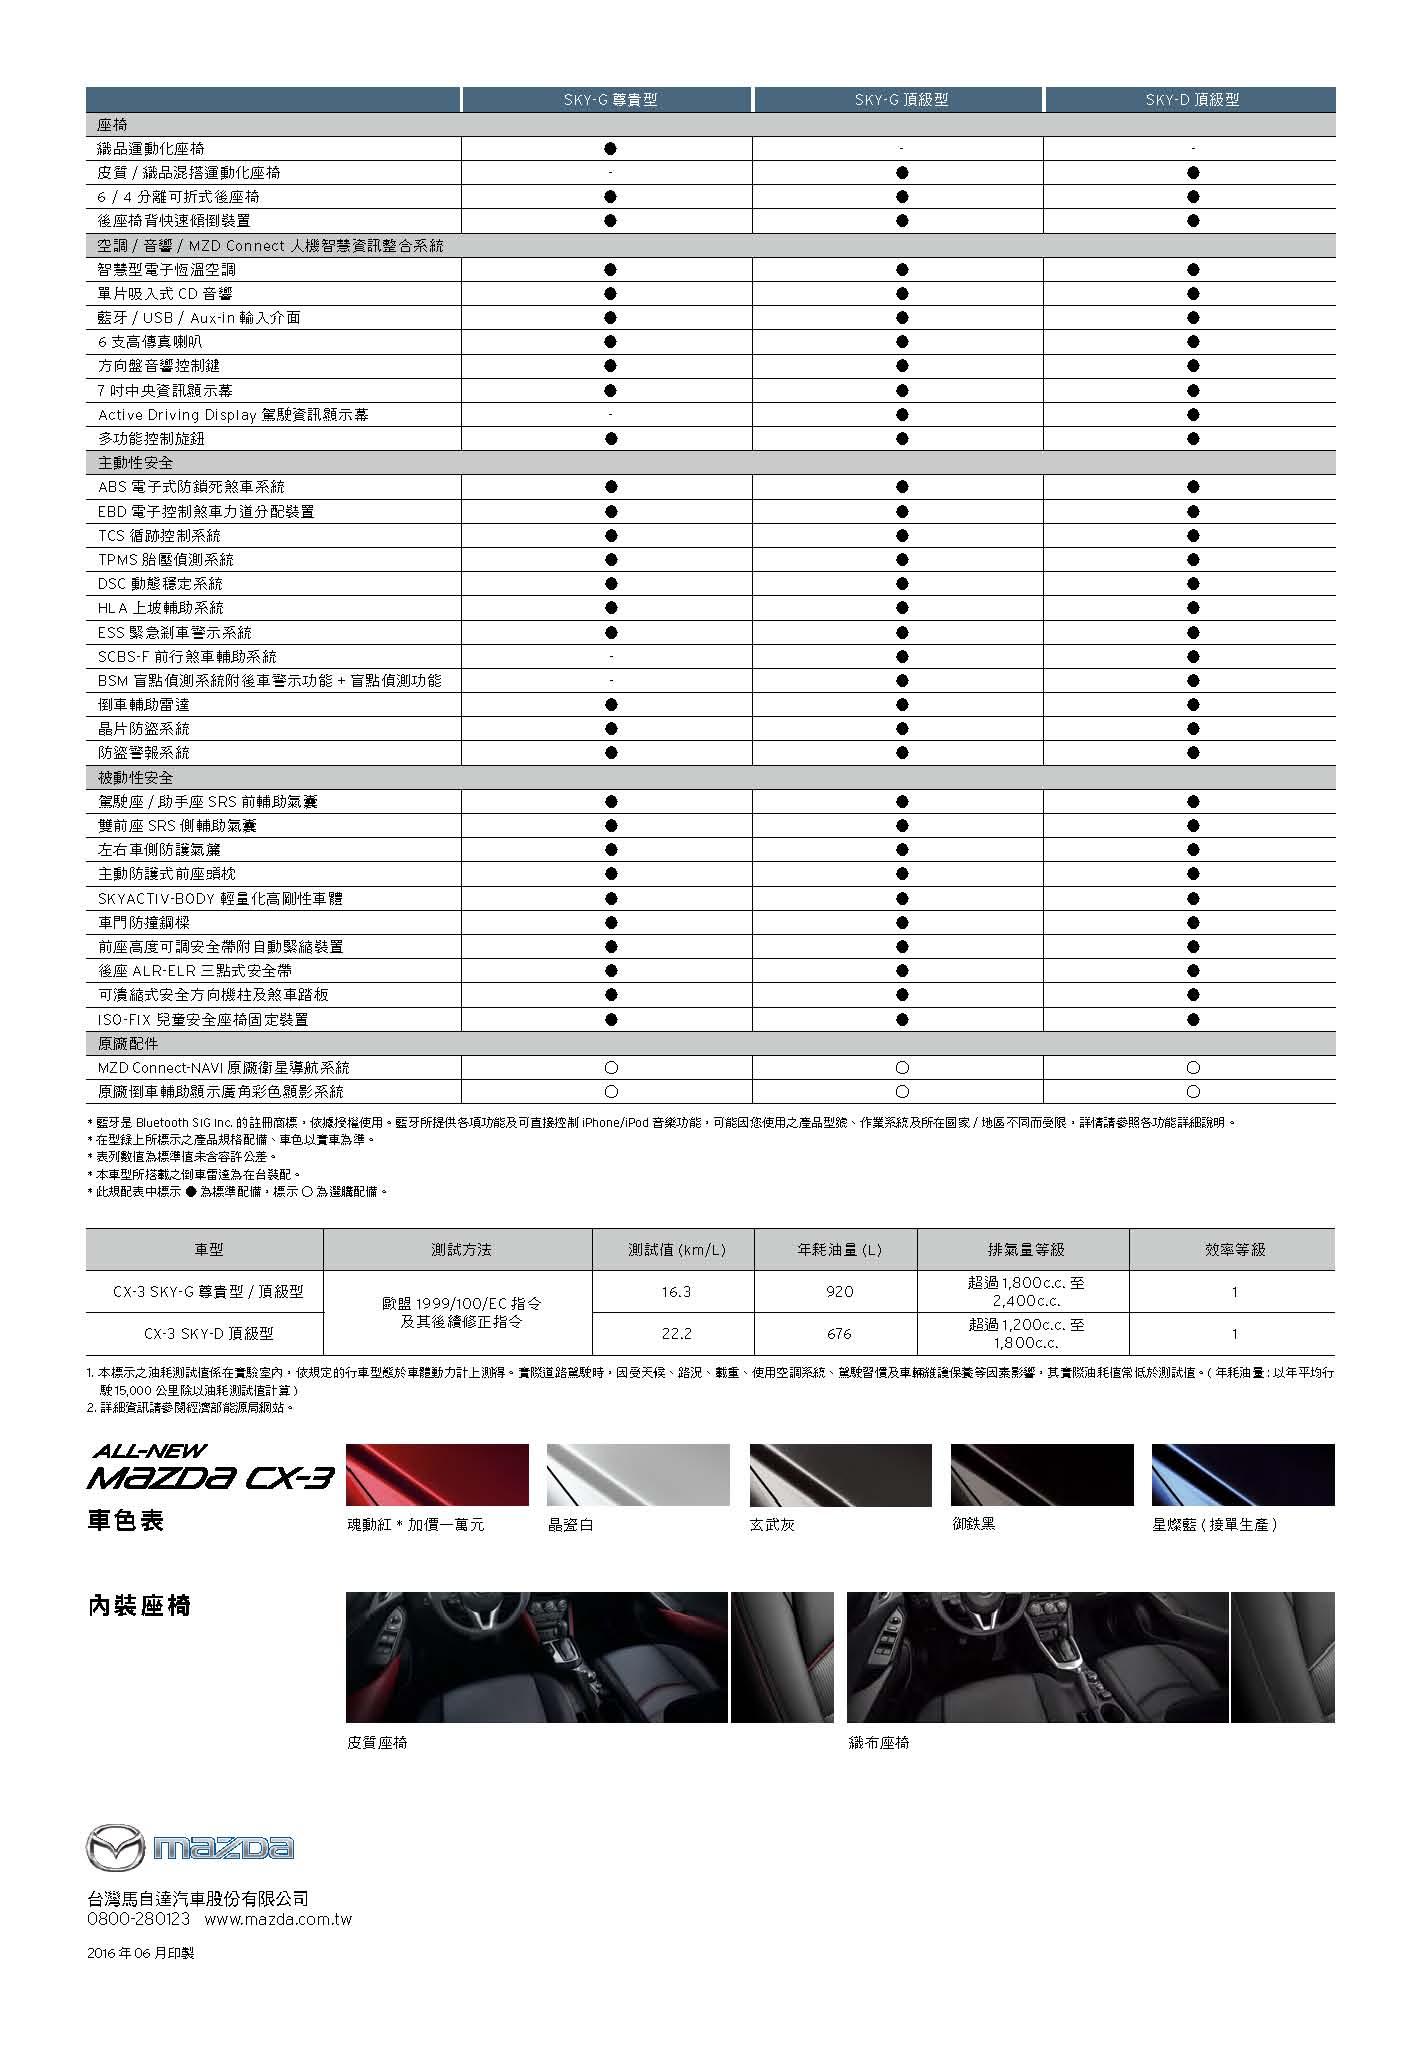 CX-3 規配表繁0622_頁面_2